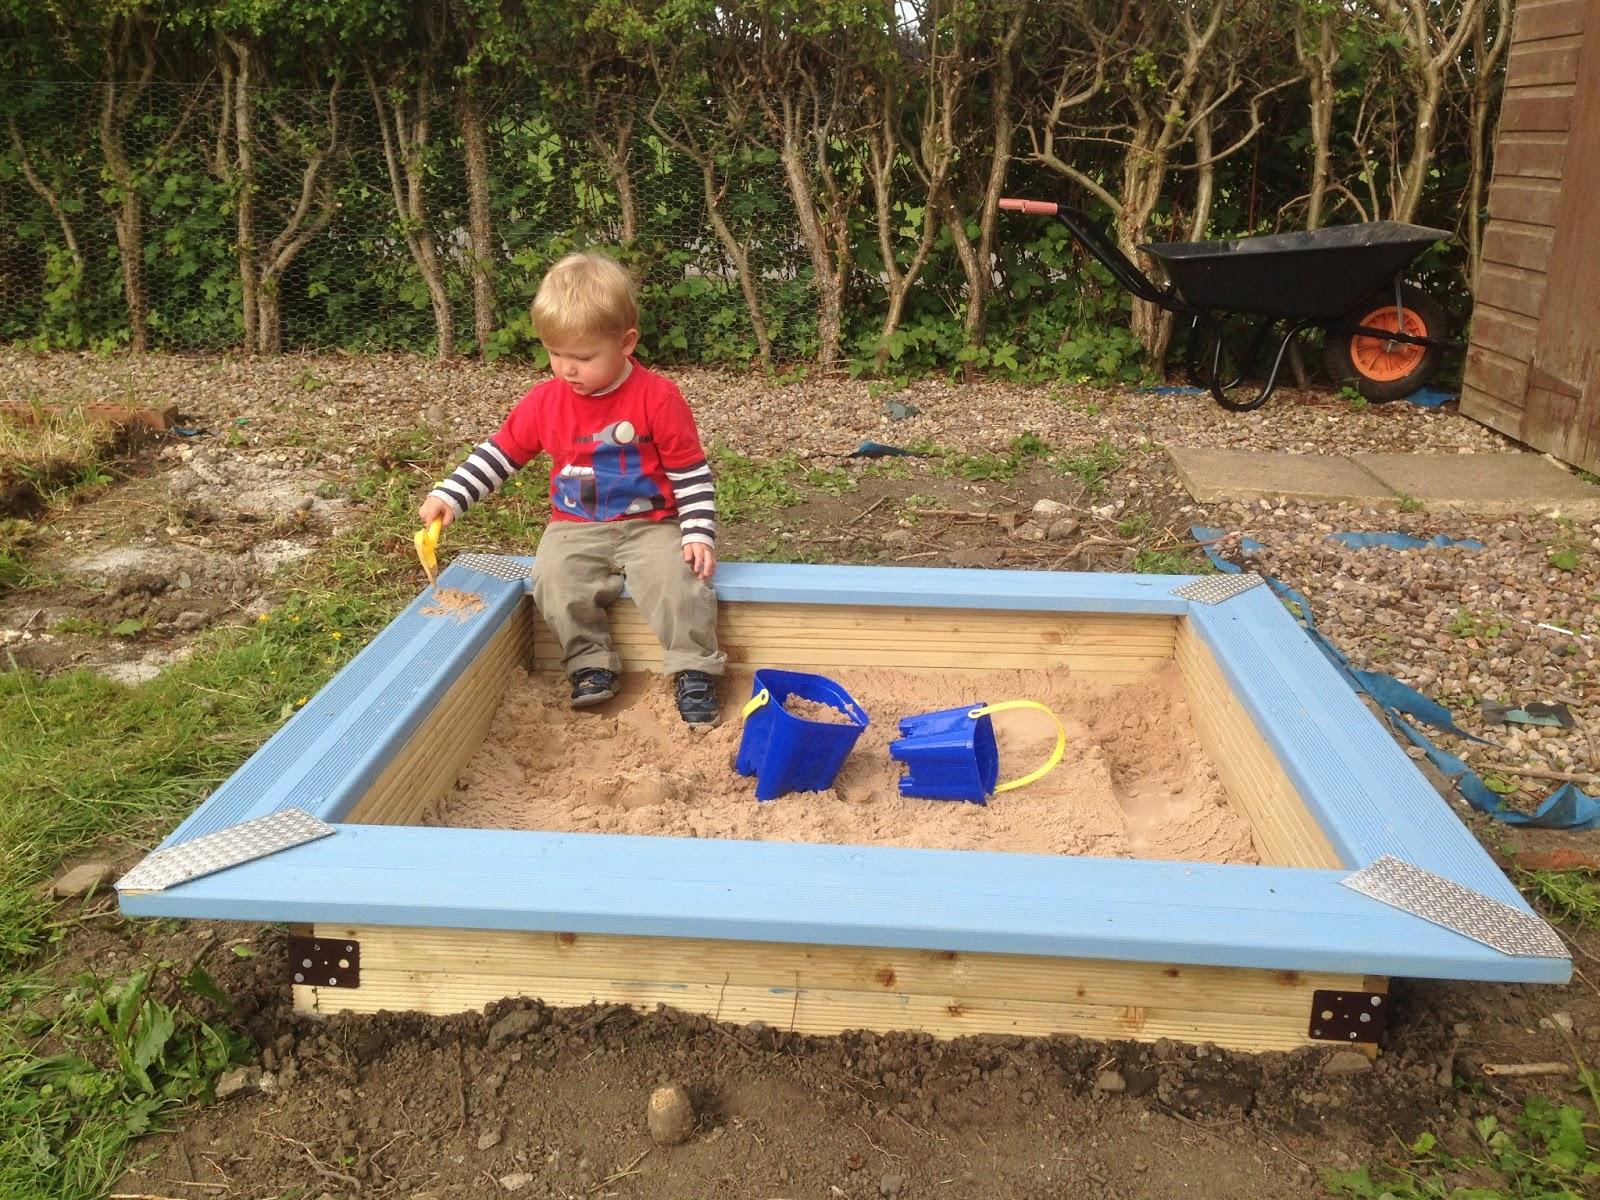 How to Build a Children's Sandpit | B&Q DIY Challenge ...